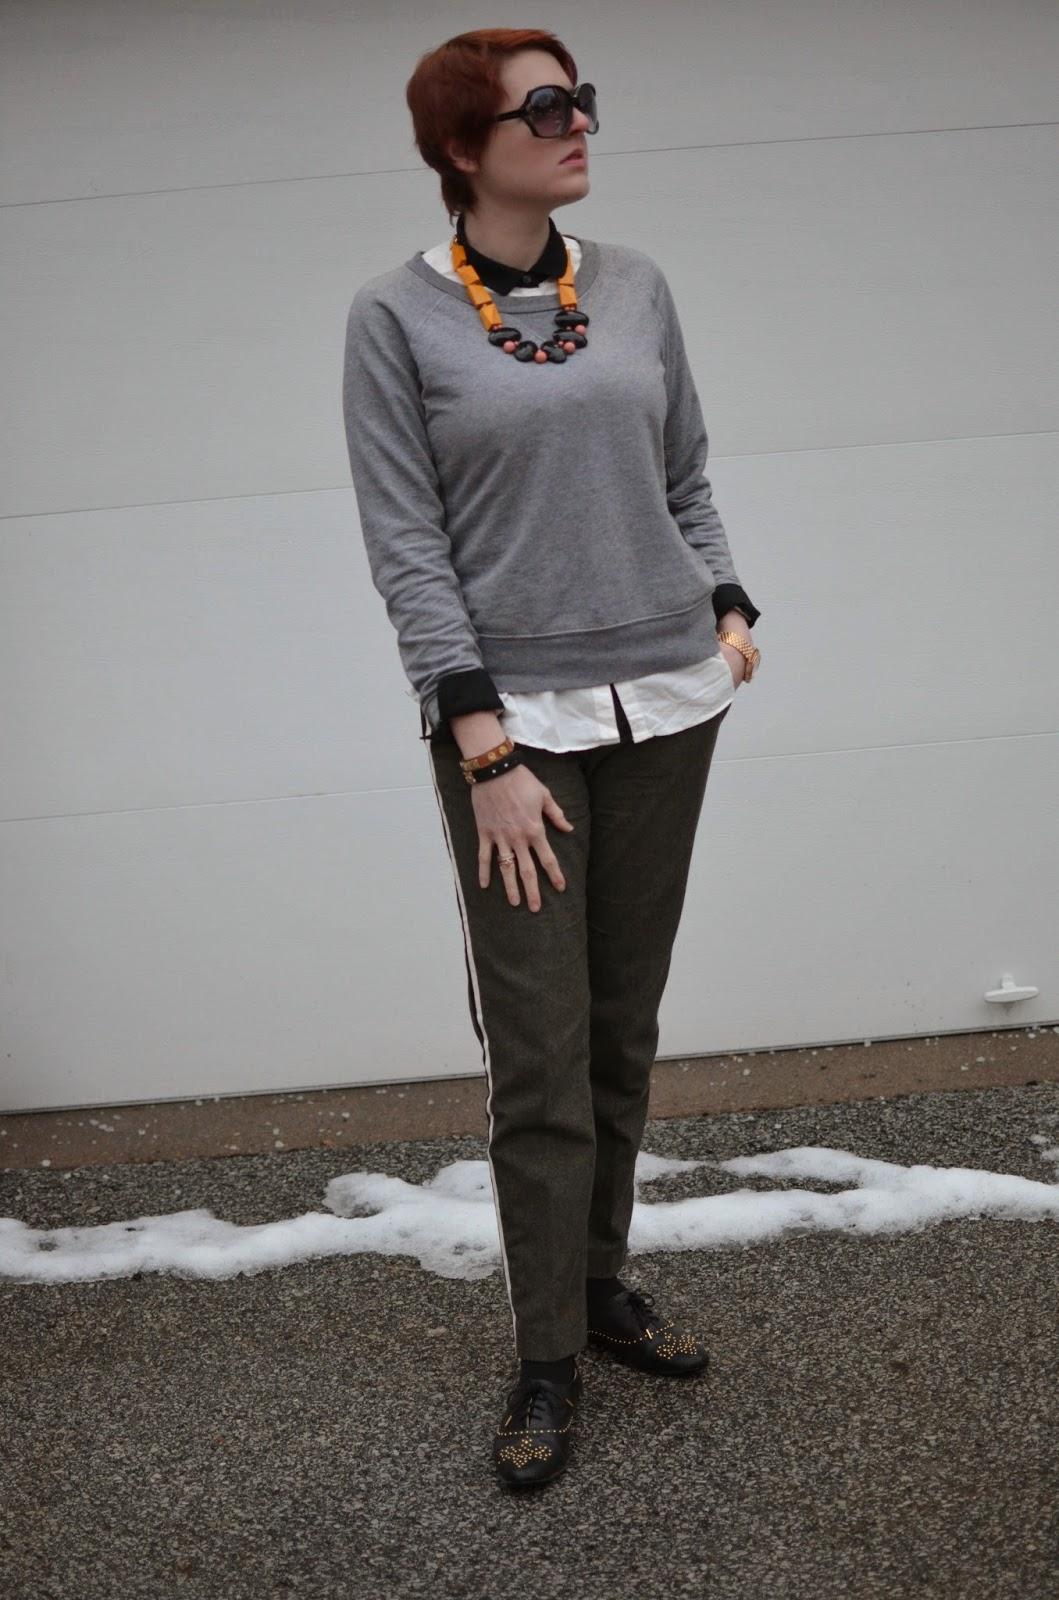 748663f24c5fd2 sweatshirt-Gap(similar here), shirt-Uniqlo(similarish here),  pants/shoes-Zara(on sale here and similar here) , rings/bracelets-Jewel  Mint, ...